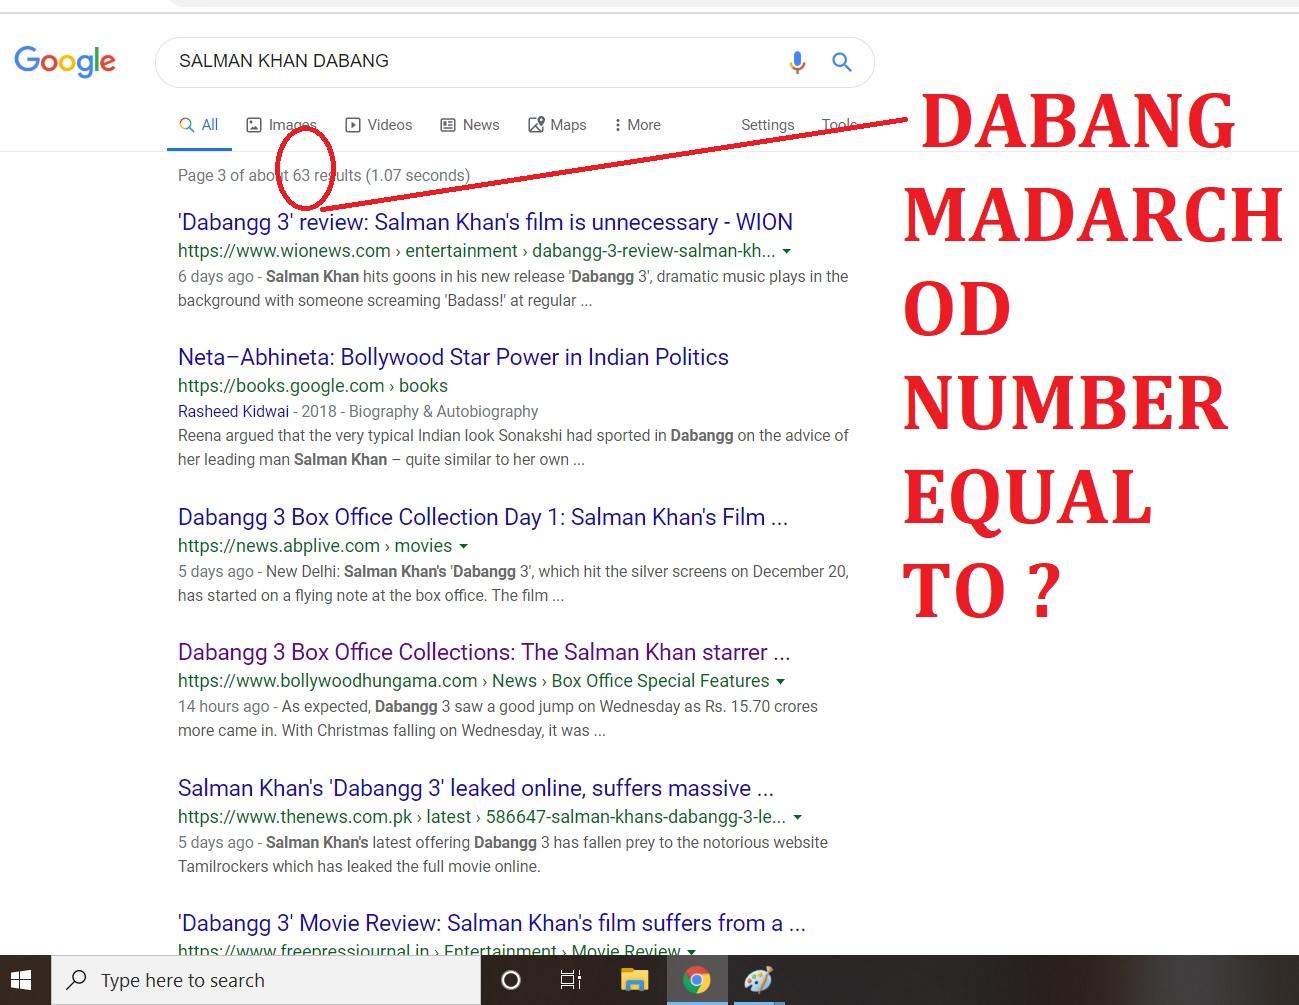 DABANG KHAN SLMAN MOVIE DABANG 3 FLOP DAY 7 REPORT